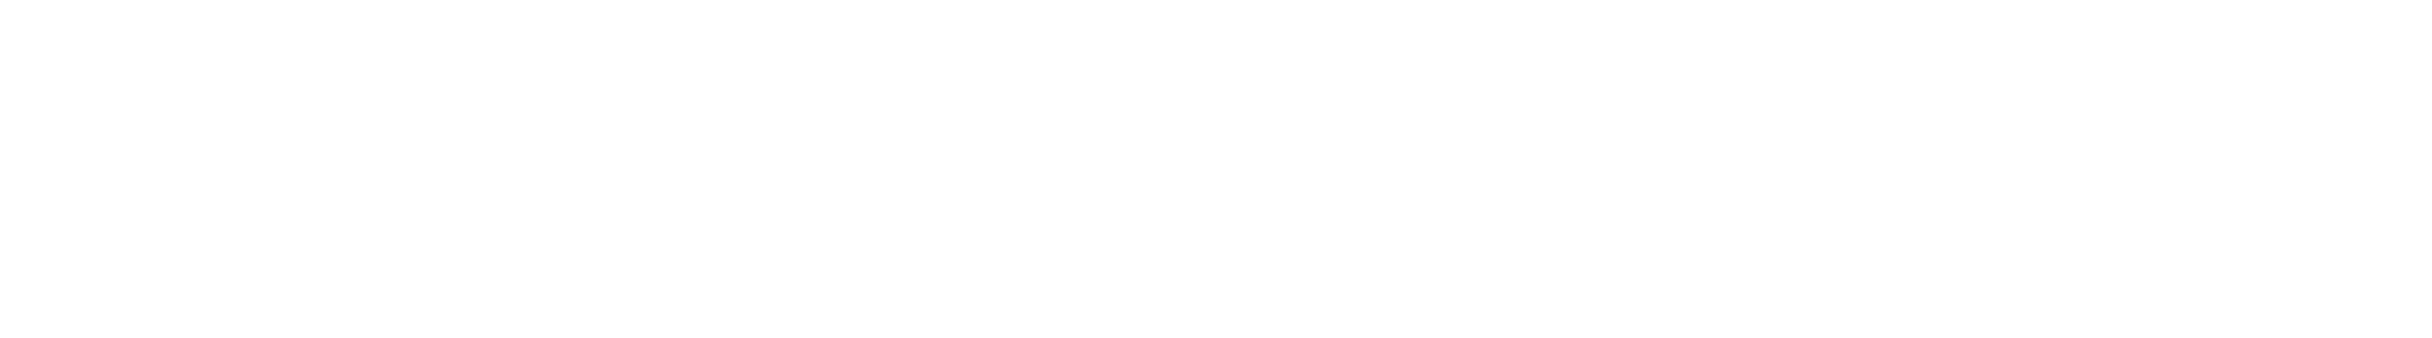 GB_BLANC_BASELINE